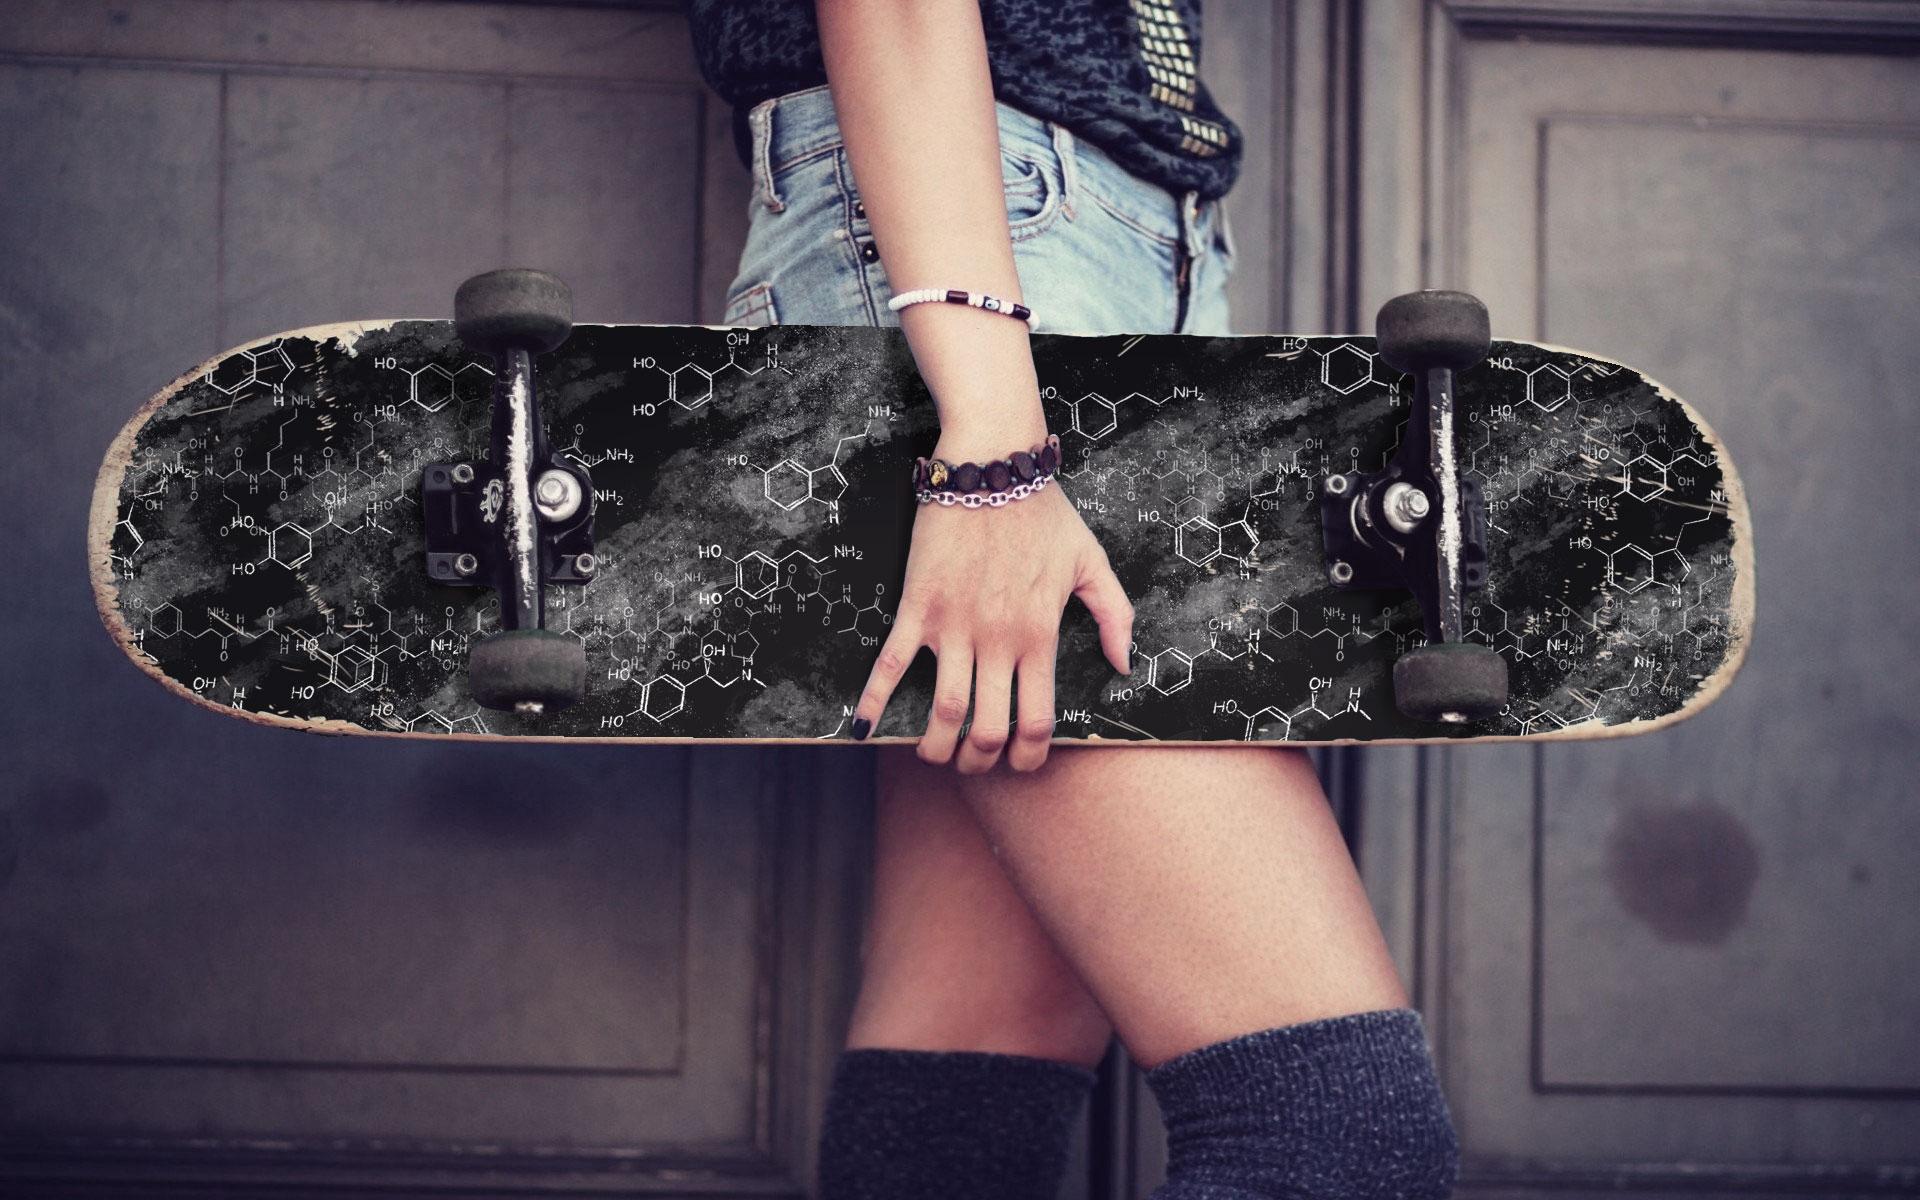 dopamine, serotonin, adrenaline, endorphins on a skateboard